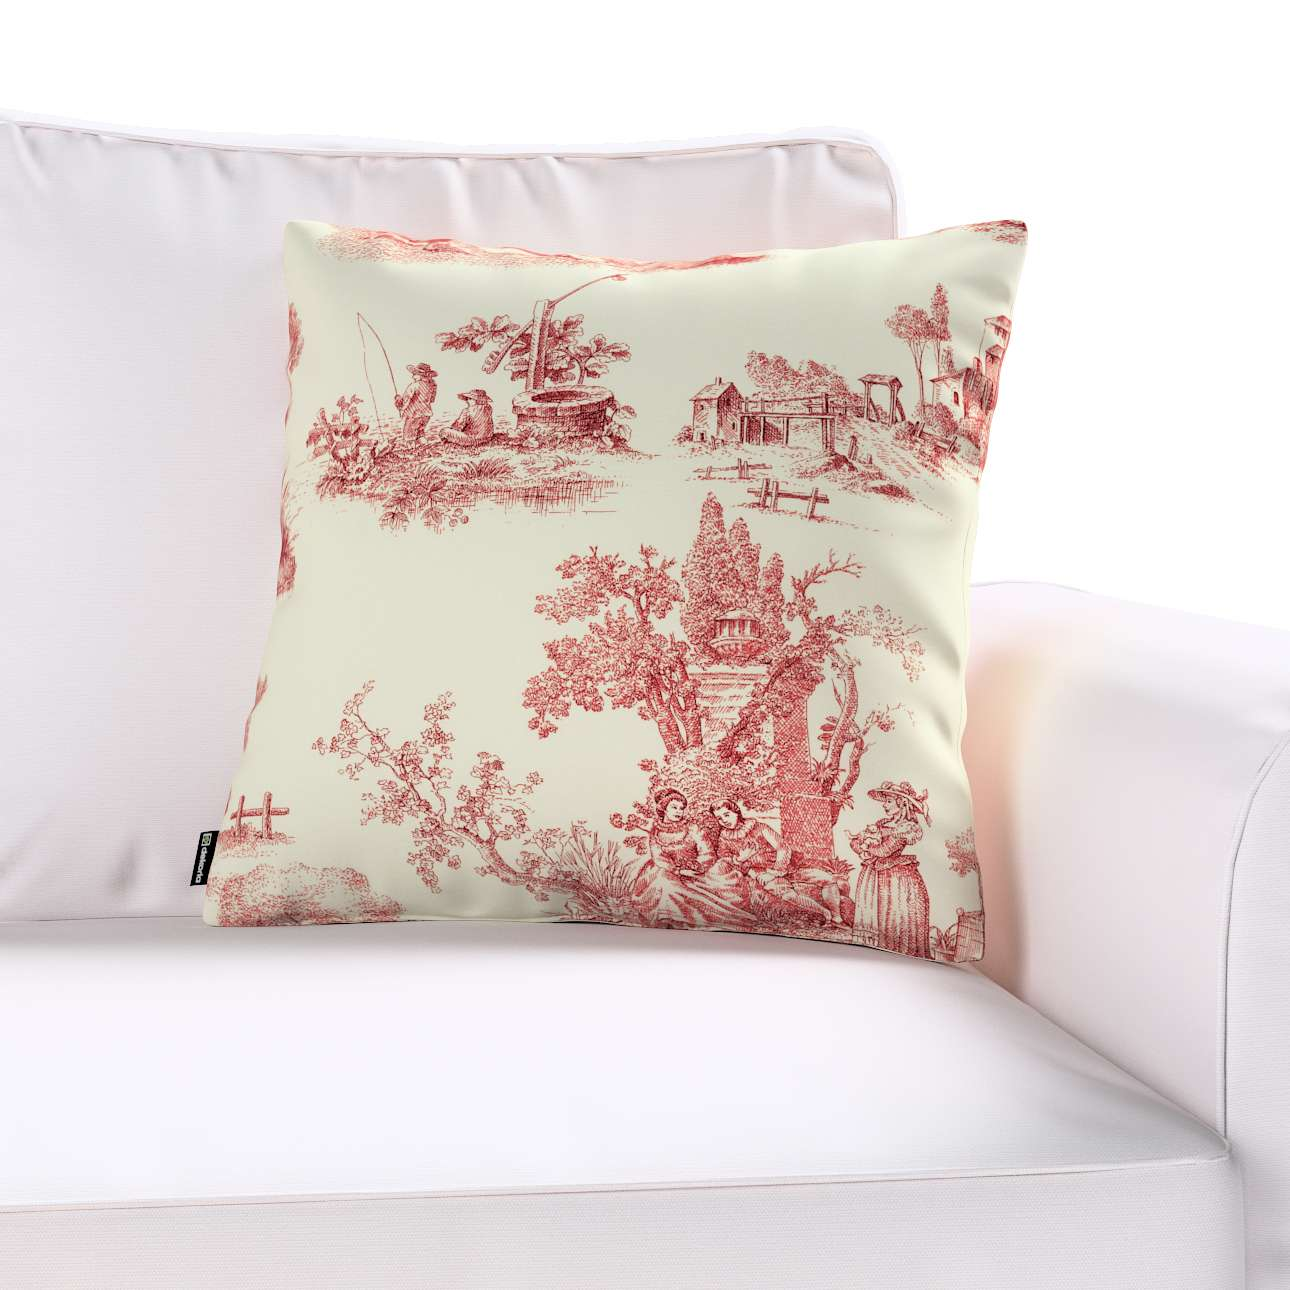 Kinga cushion cover 43 x 43 cm (17 x 17 inch) in collection Avinon, fabric: 132-15